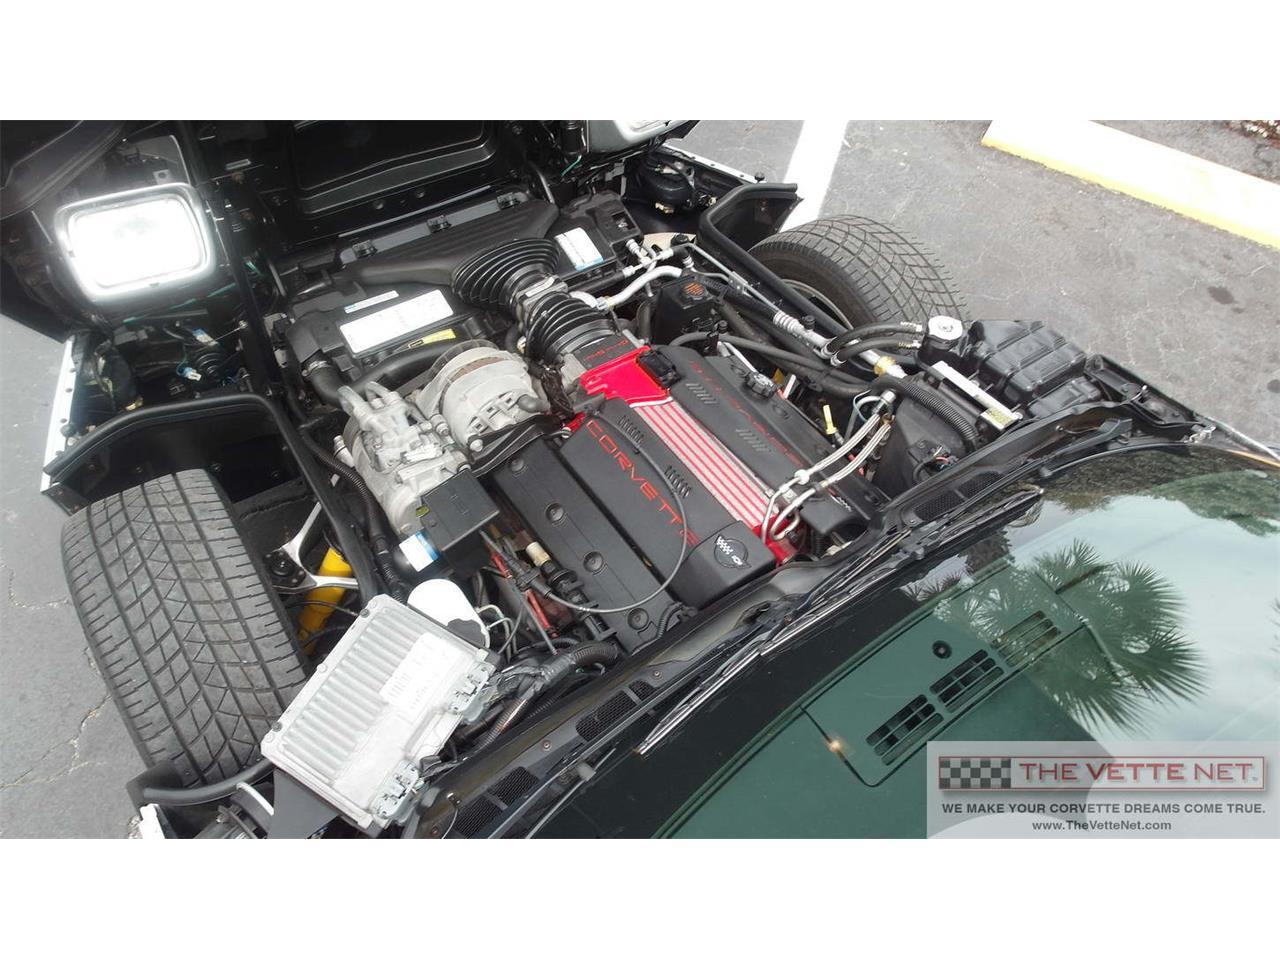 Large Picture of '96 Corvette located in Florida - $19,990.00 - IVON